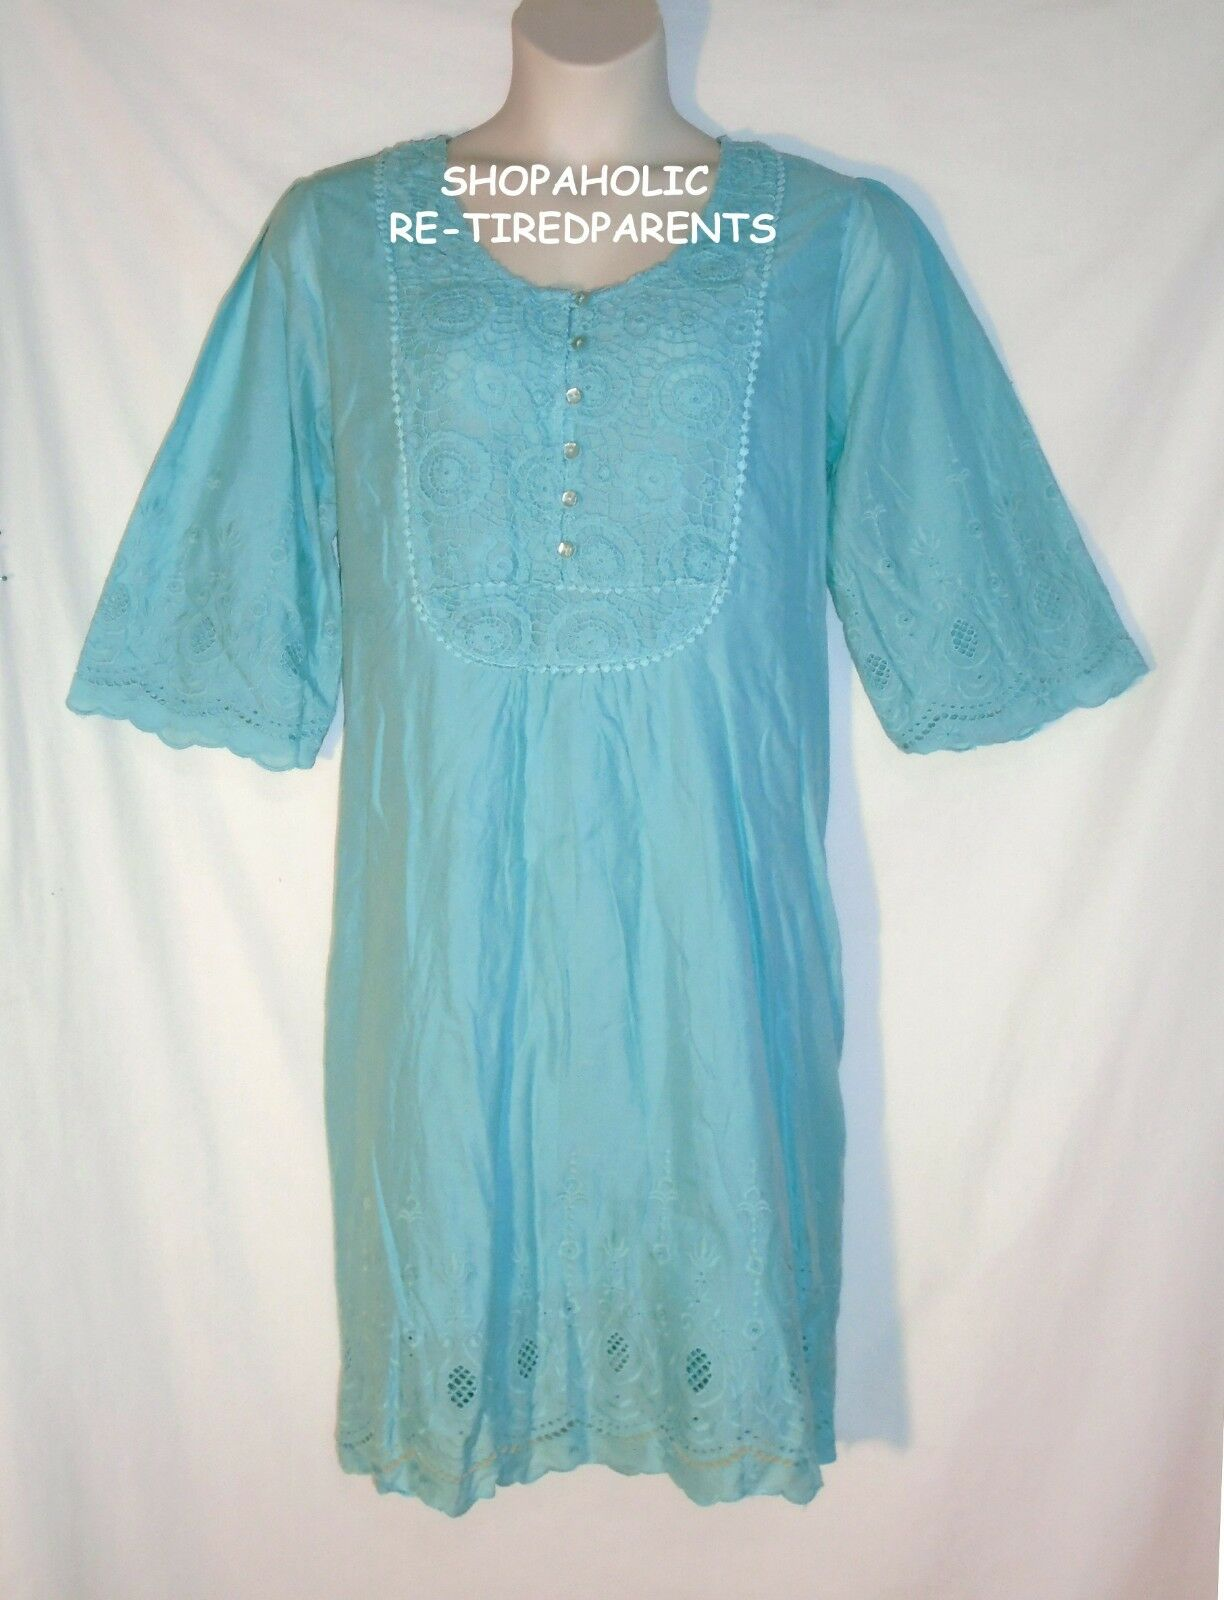 DENIM 24 7 – DRESS – BABY DOLL - blueE - COTTON – LINED – PLUS SIZE 24W – NEW